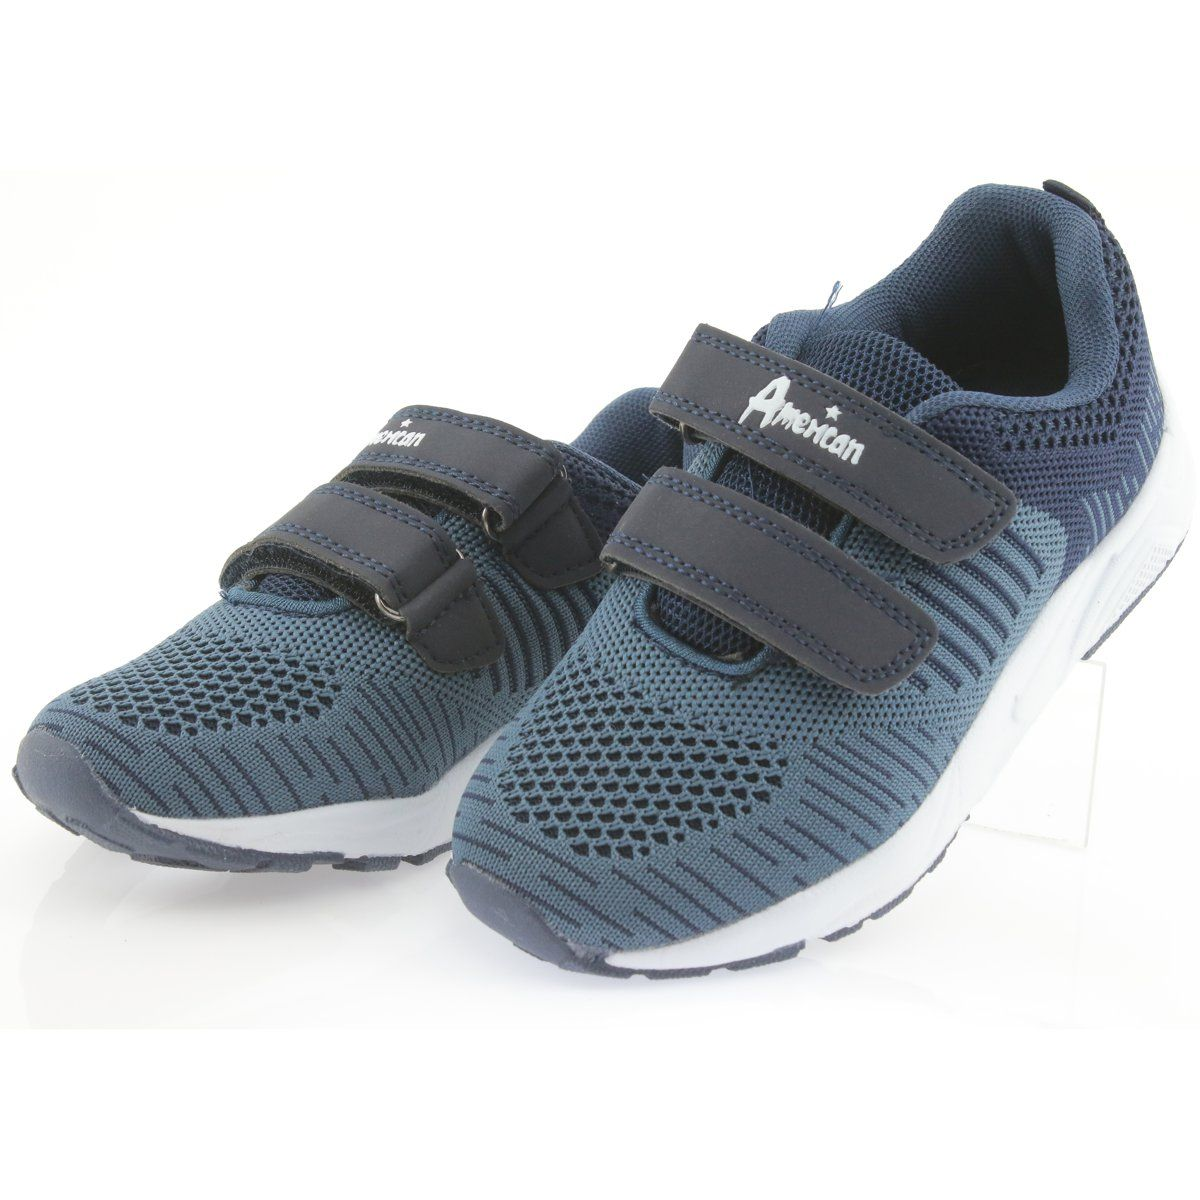 American Club Buty Sportowe Na Rzepy American Ca05 Granatowe Sports Shoes Shoes Kid Shoes